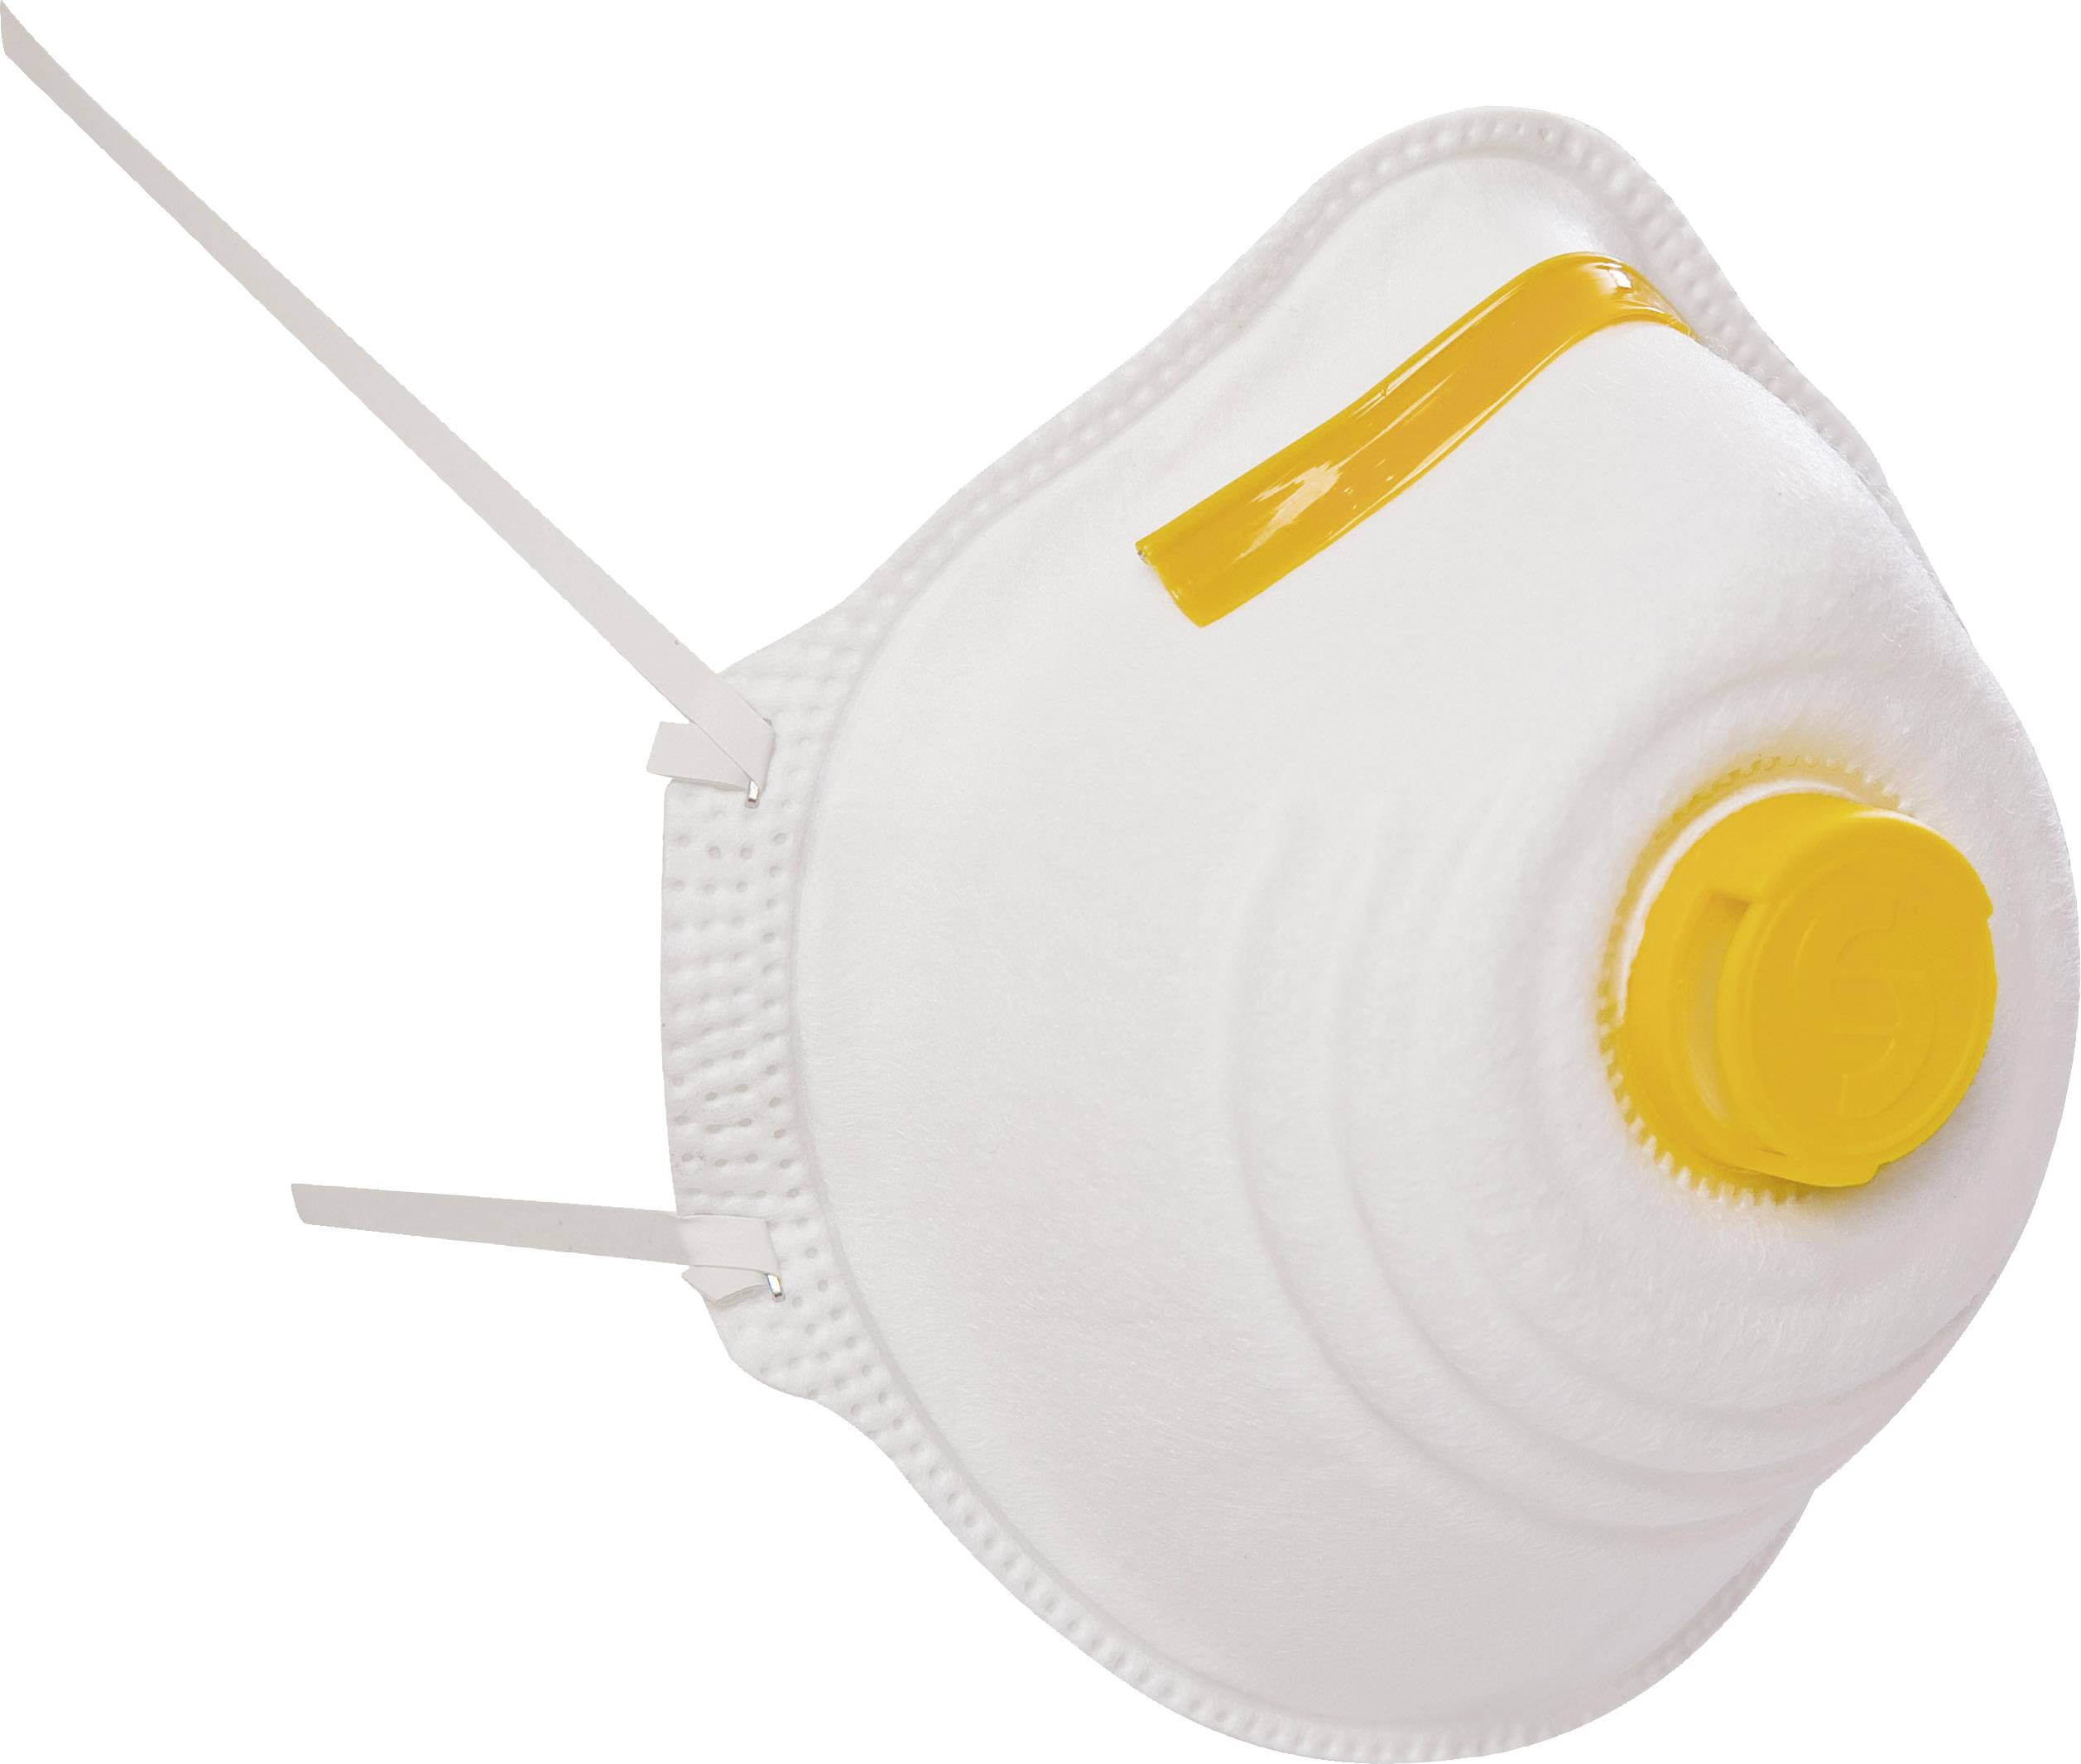 Respirátor proti jemnému prachu, s ventilom EKASTU Sekur 411 381, 12 ks